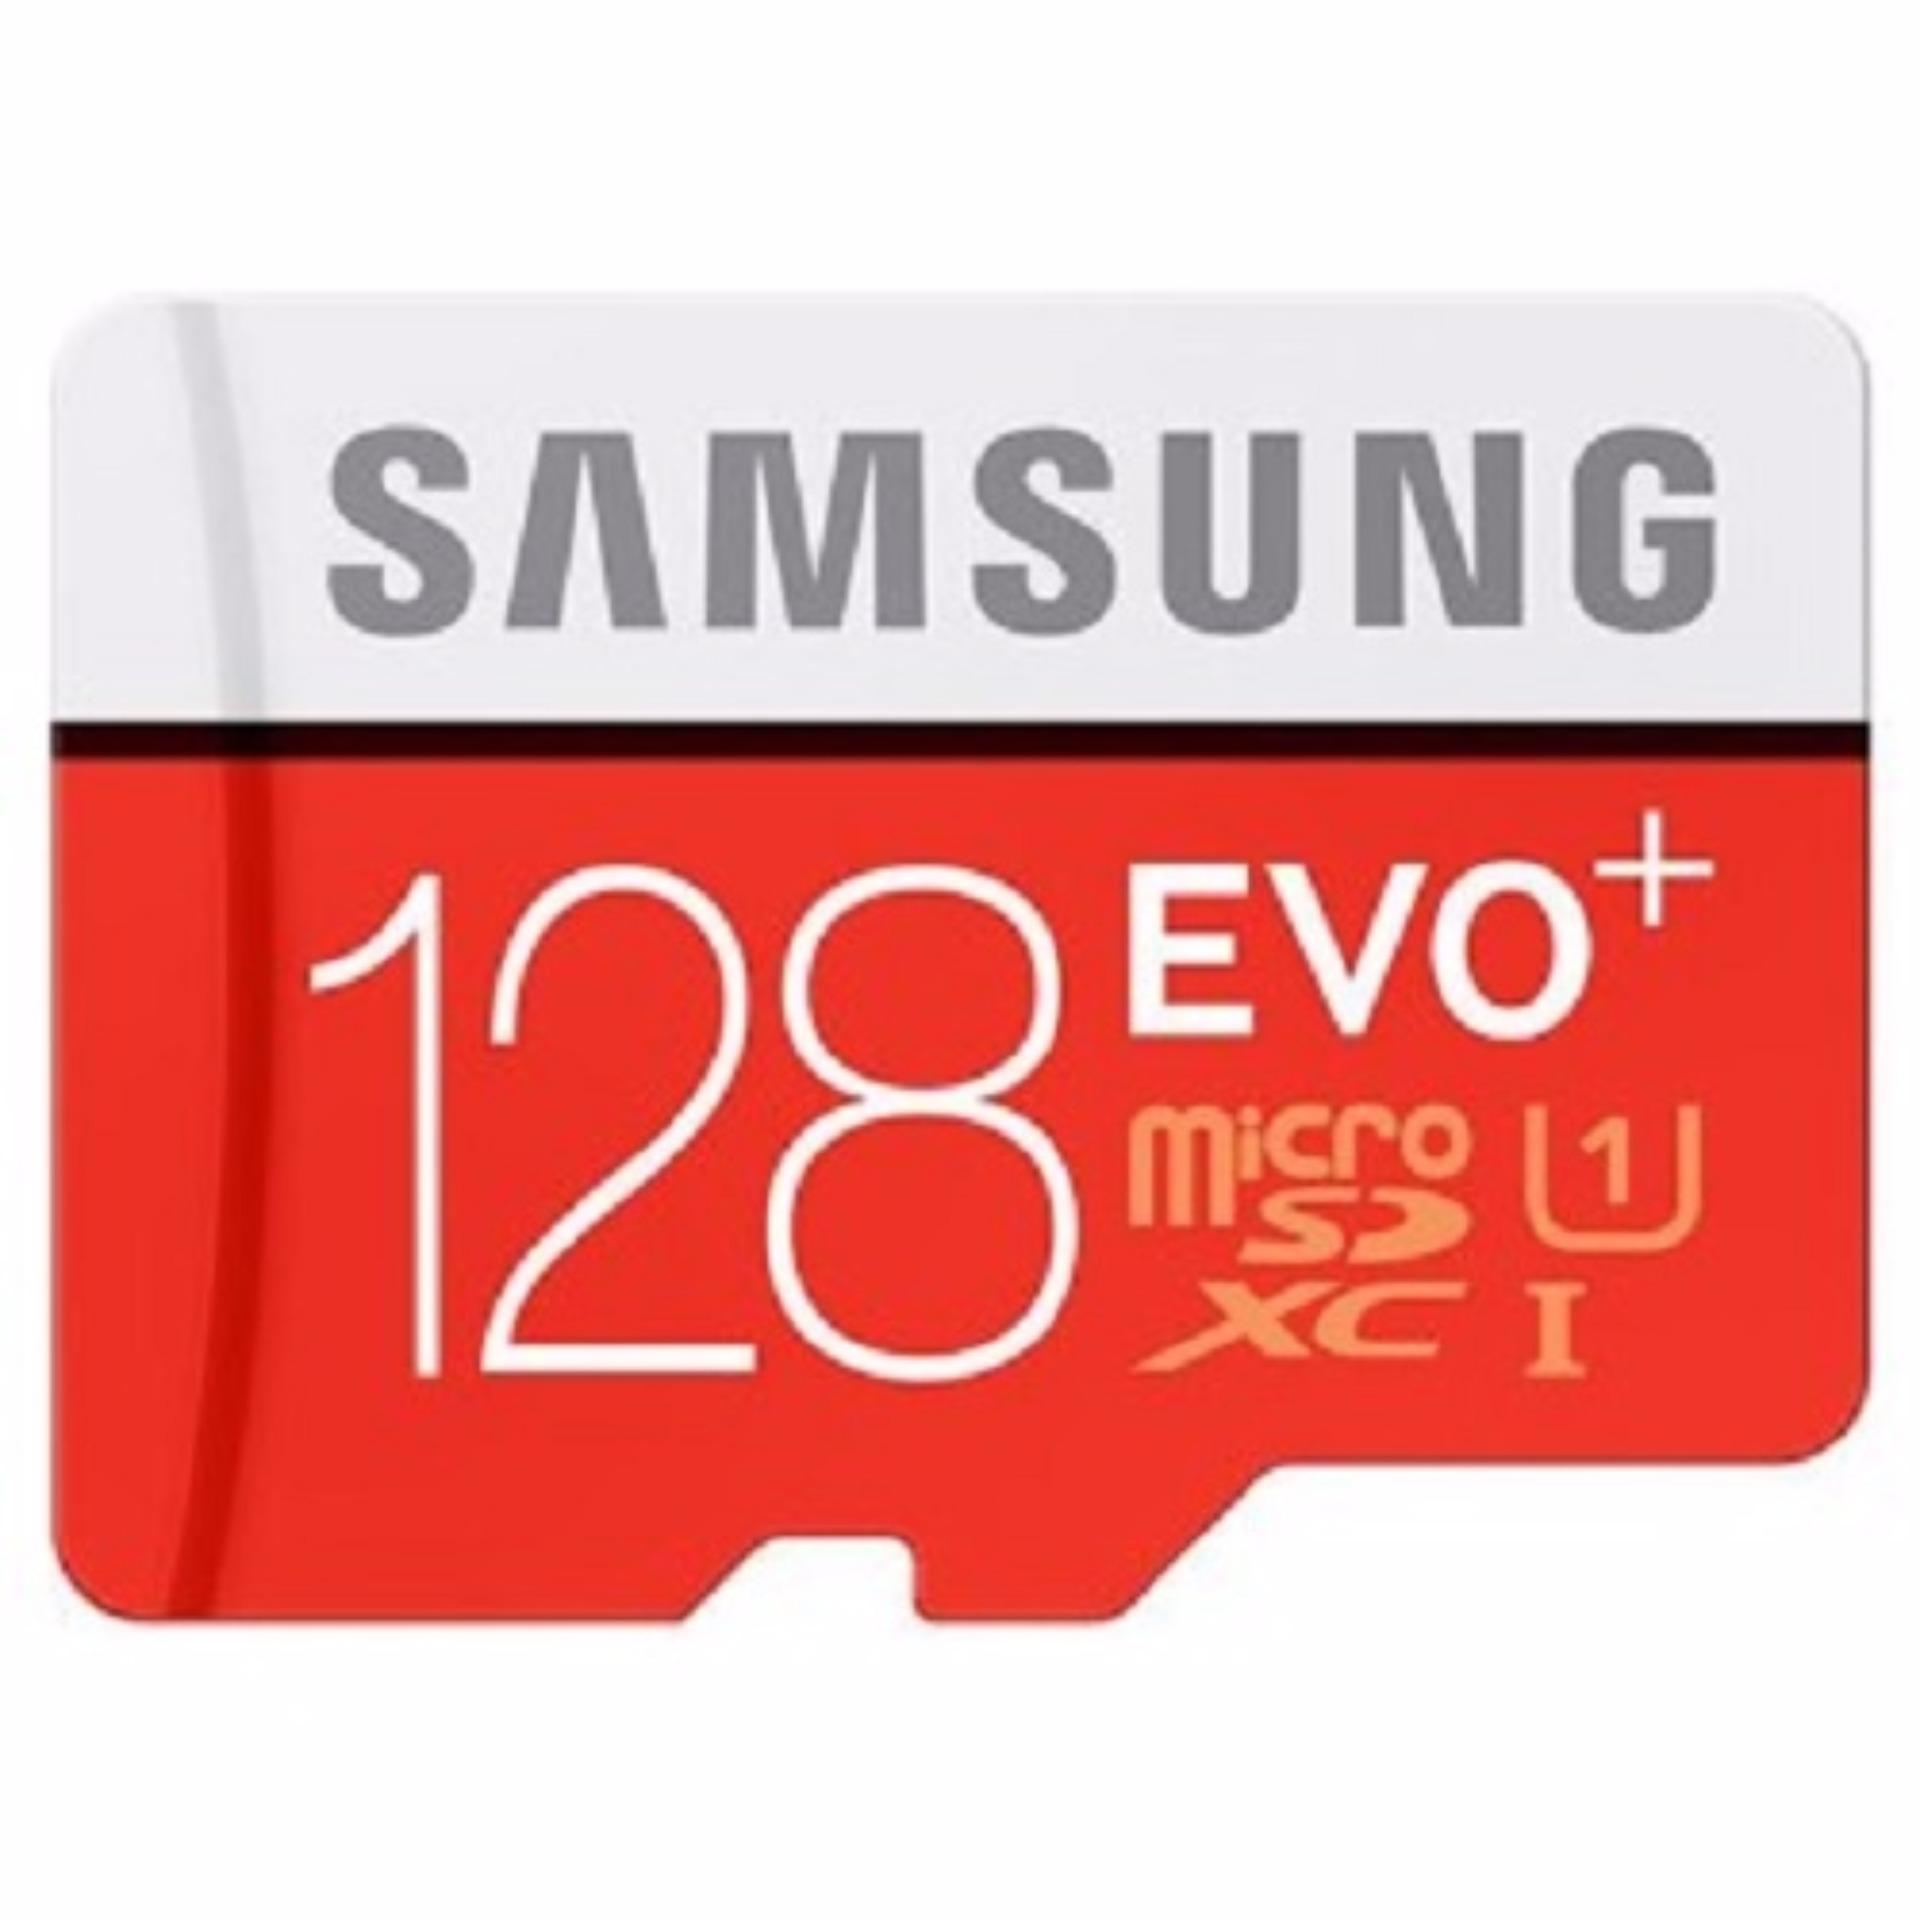 Thẻ nhớ samsung evo 128Gb